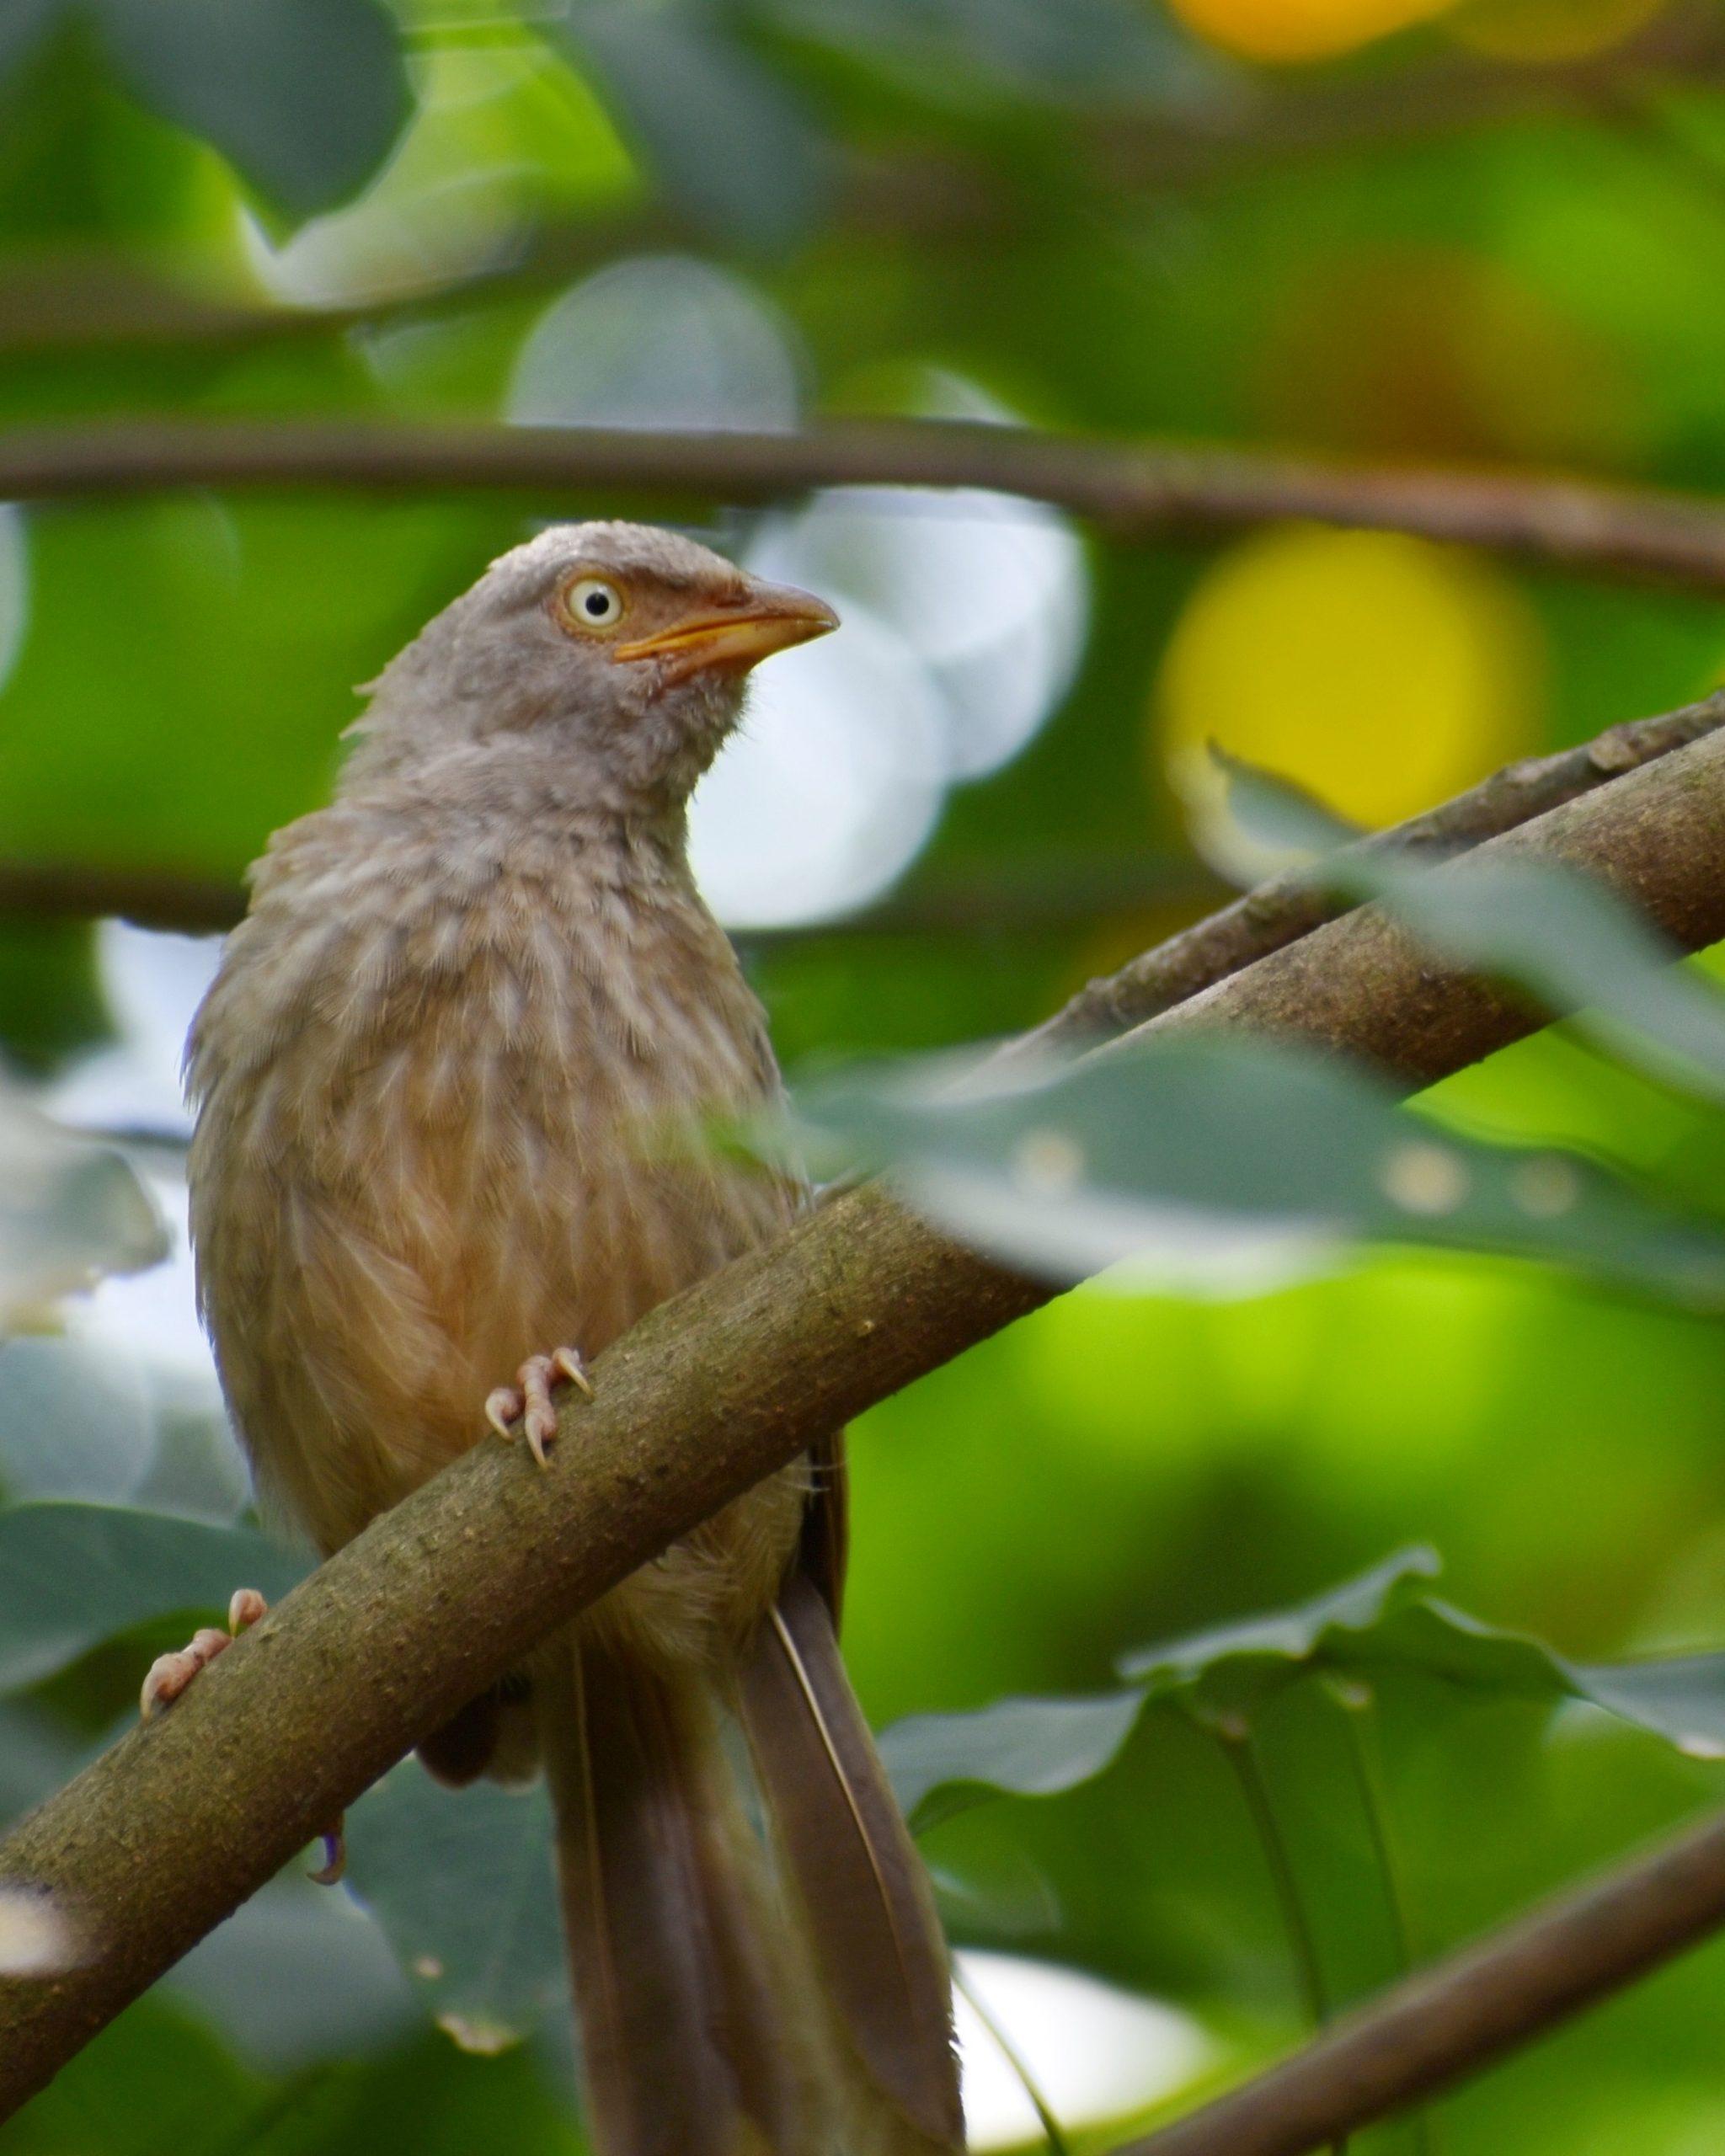 Jungle Babbler in Tree Branch on Focus